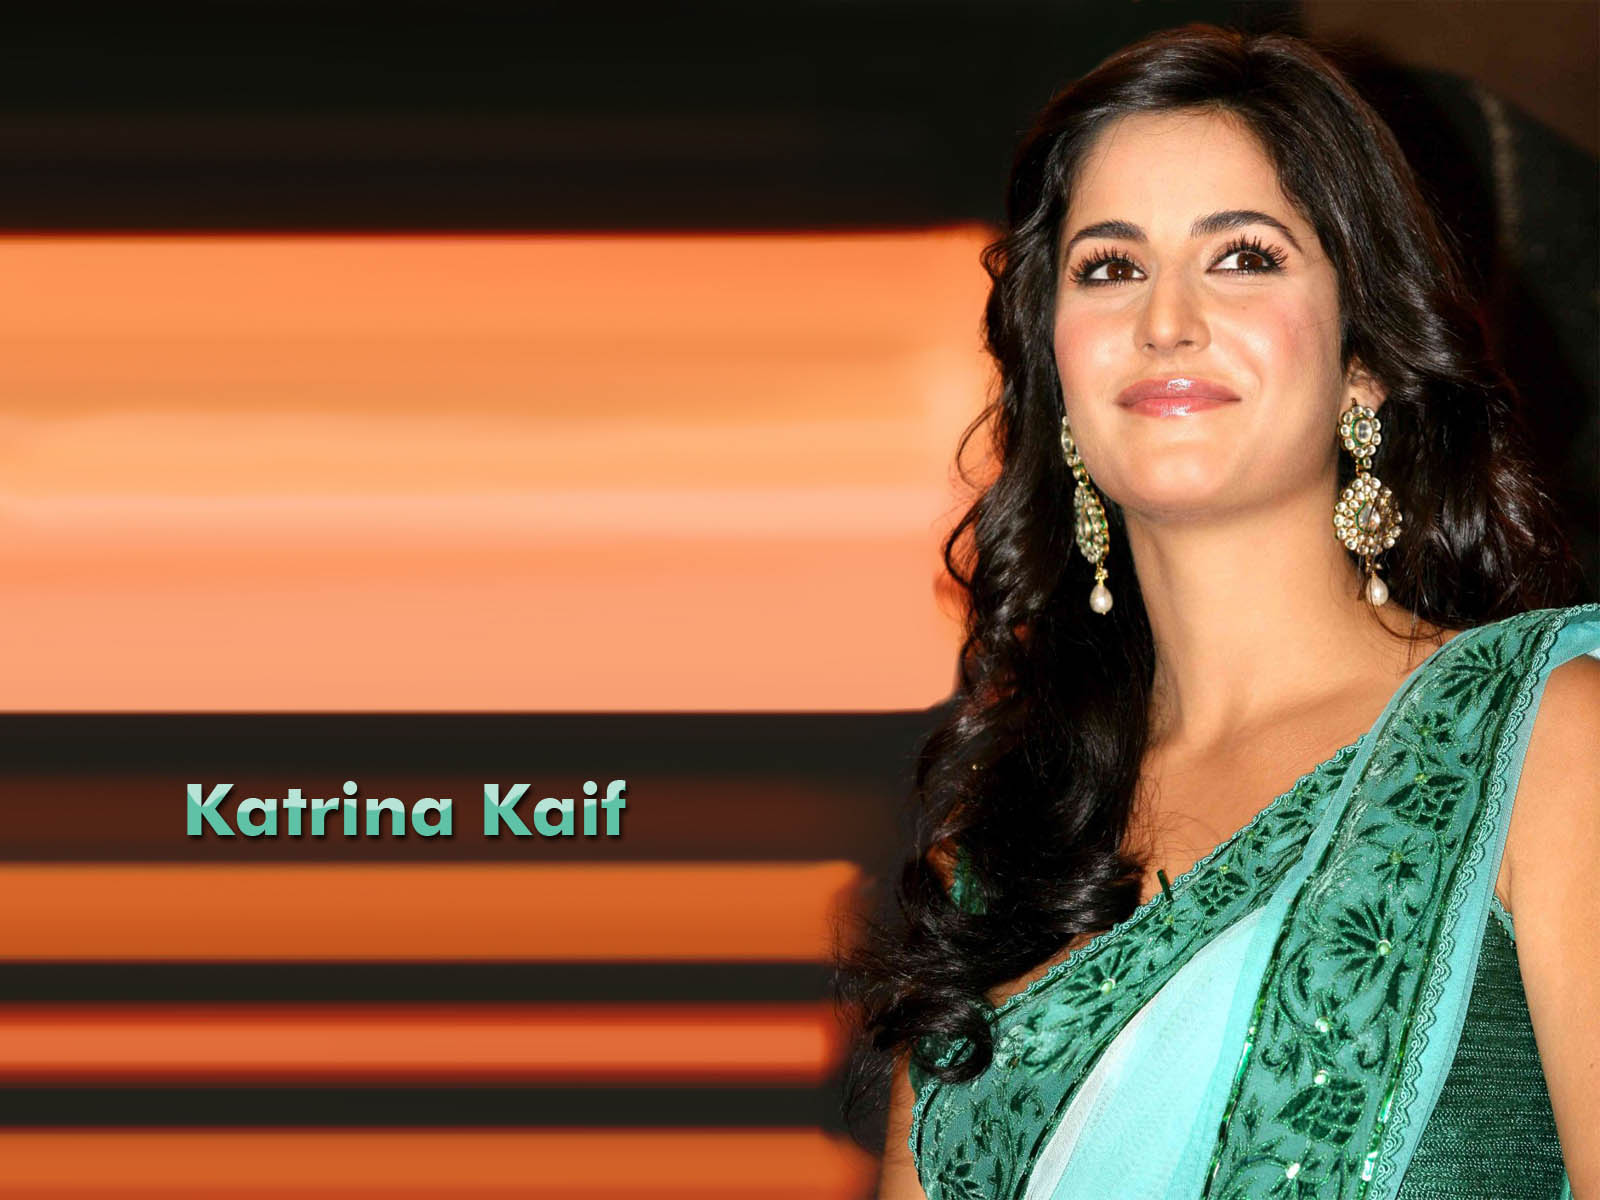 Katrina Kaif Cool Wallpapers  Hot Katrina Kaif Fans-2774